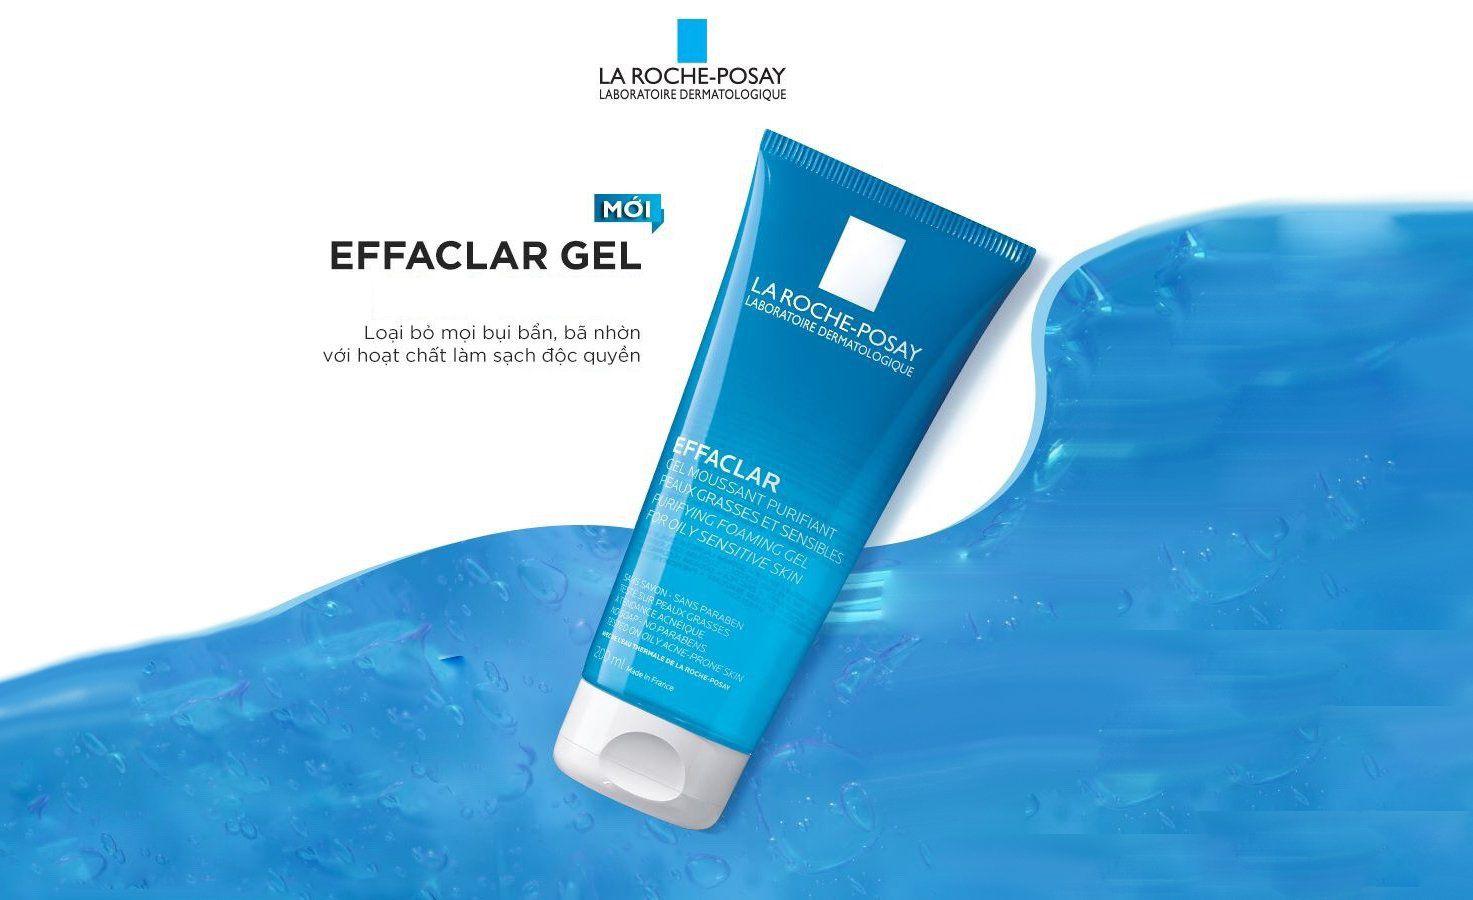 Sữa rửa mặt La Roche Posay Effaclar Purifying Foaming Gel có tốt không?